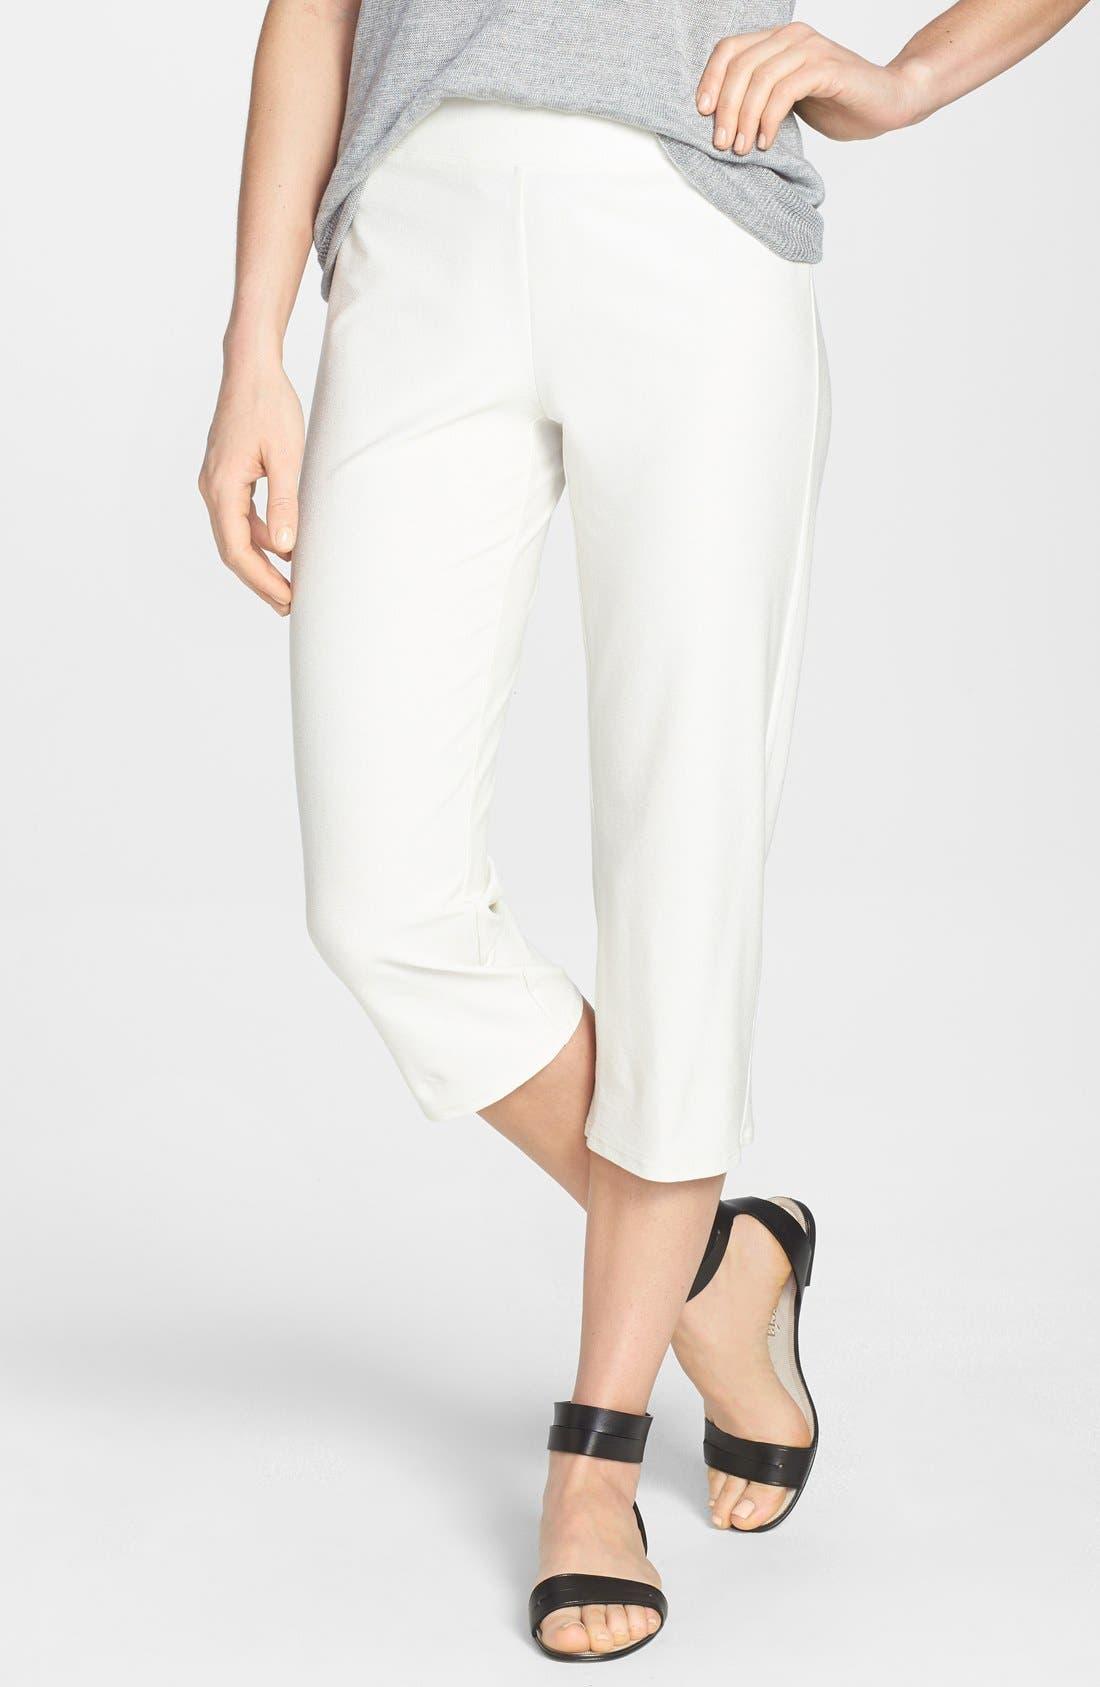 Alternate Image 1 Selected - Eileen Fisher Slim Capri Pants (Regular & Petite) (Online Only)